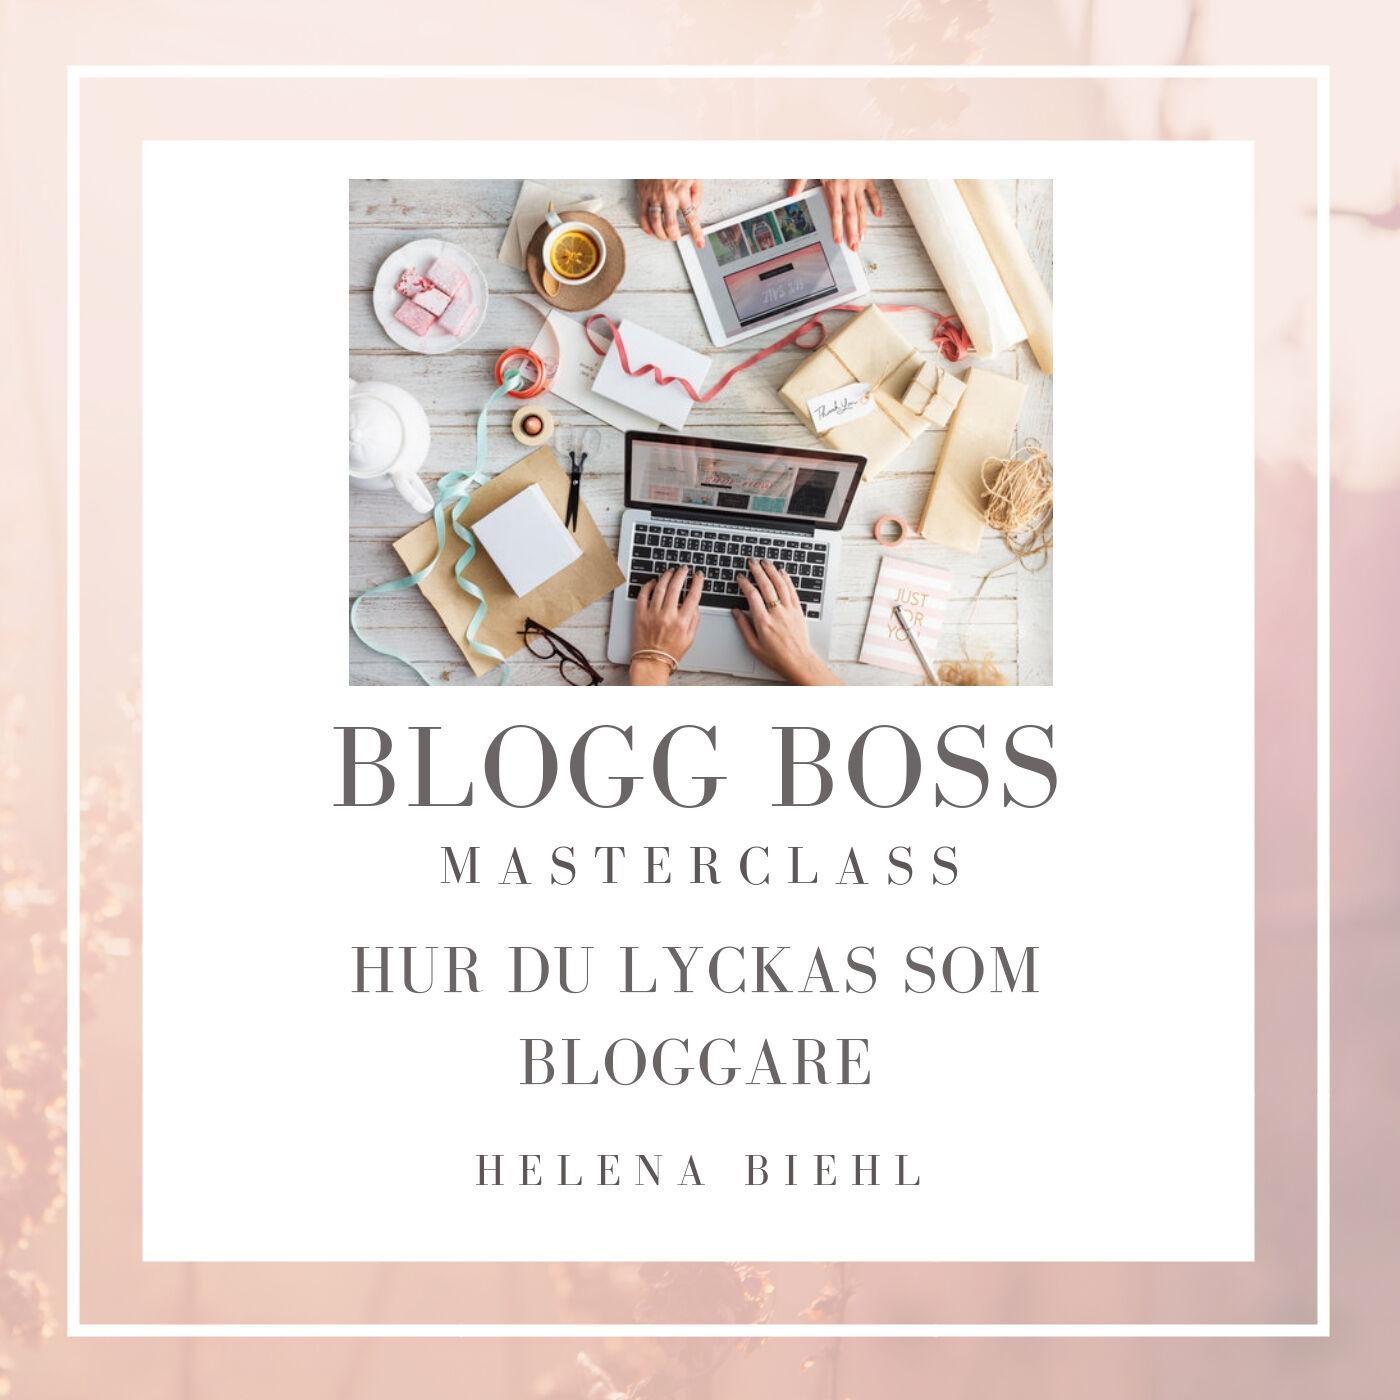 BloggBoss